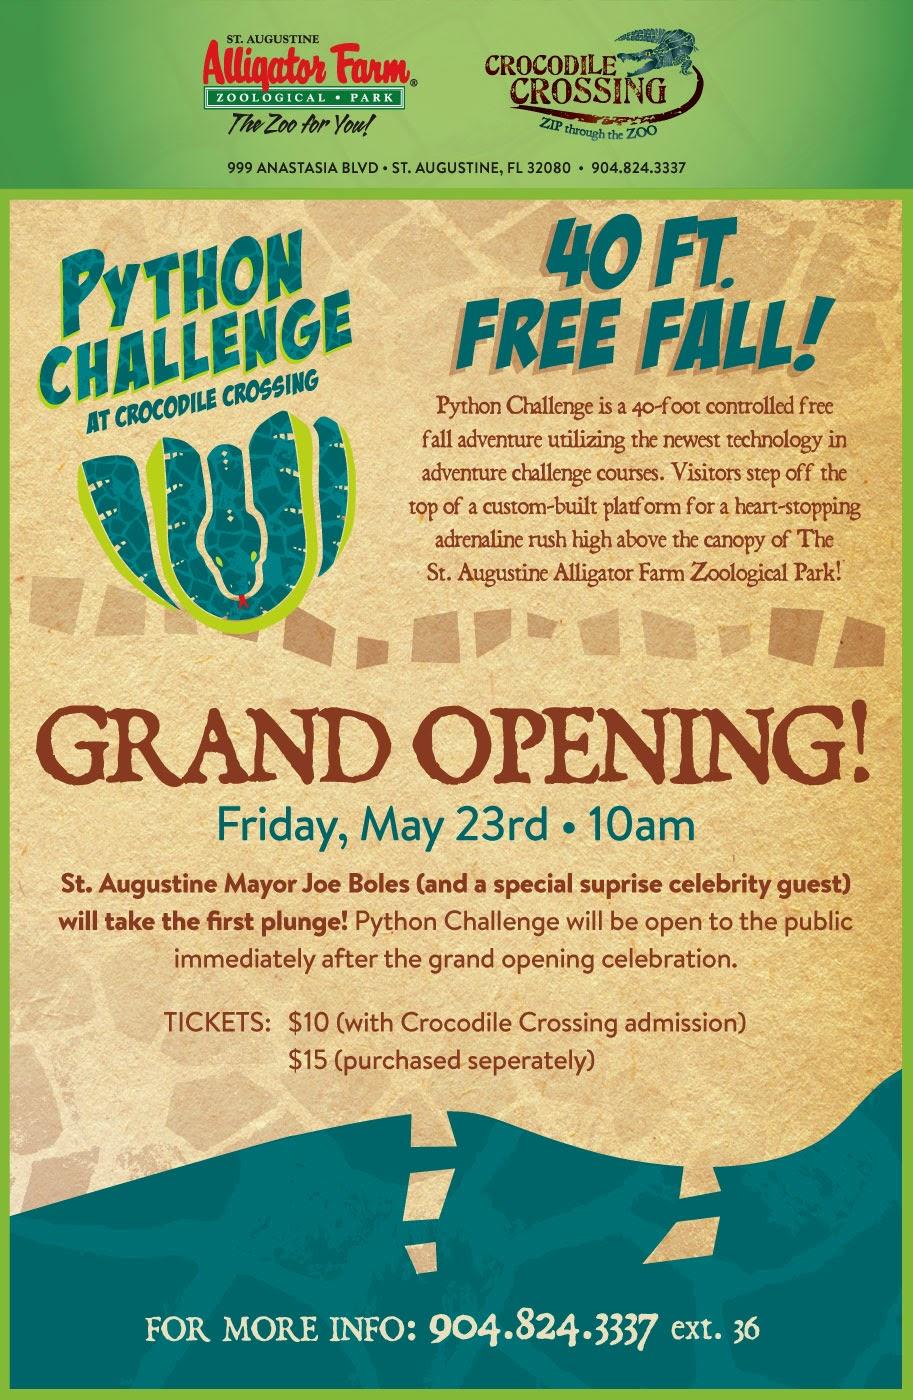 3  PythonChallenge GrandOpening St. Francis Inn St. Augustine Bed and Breakfast